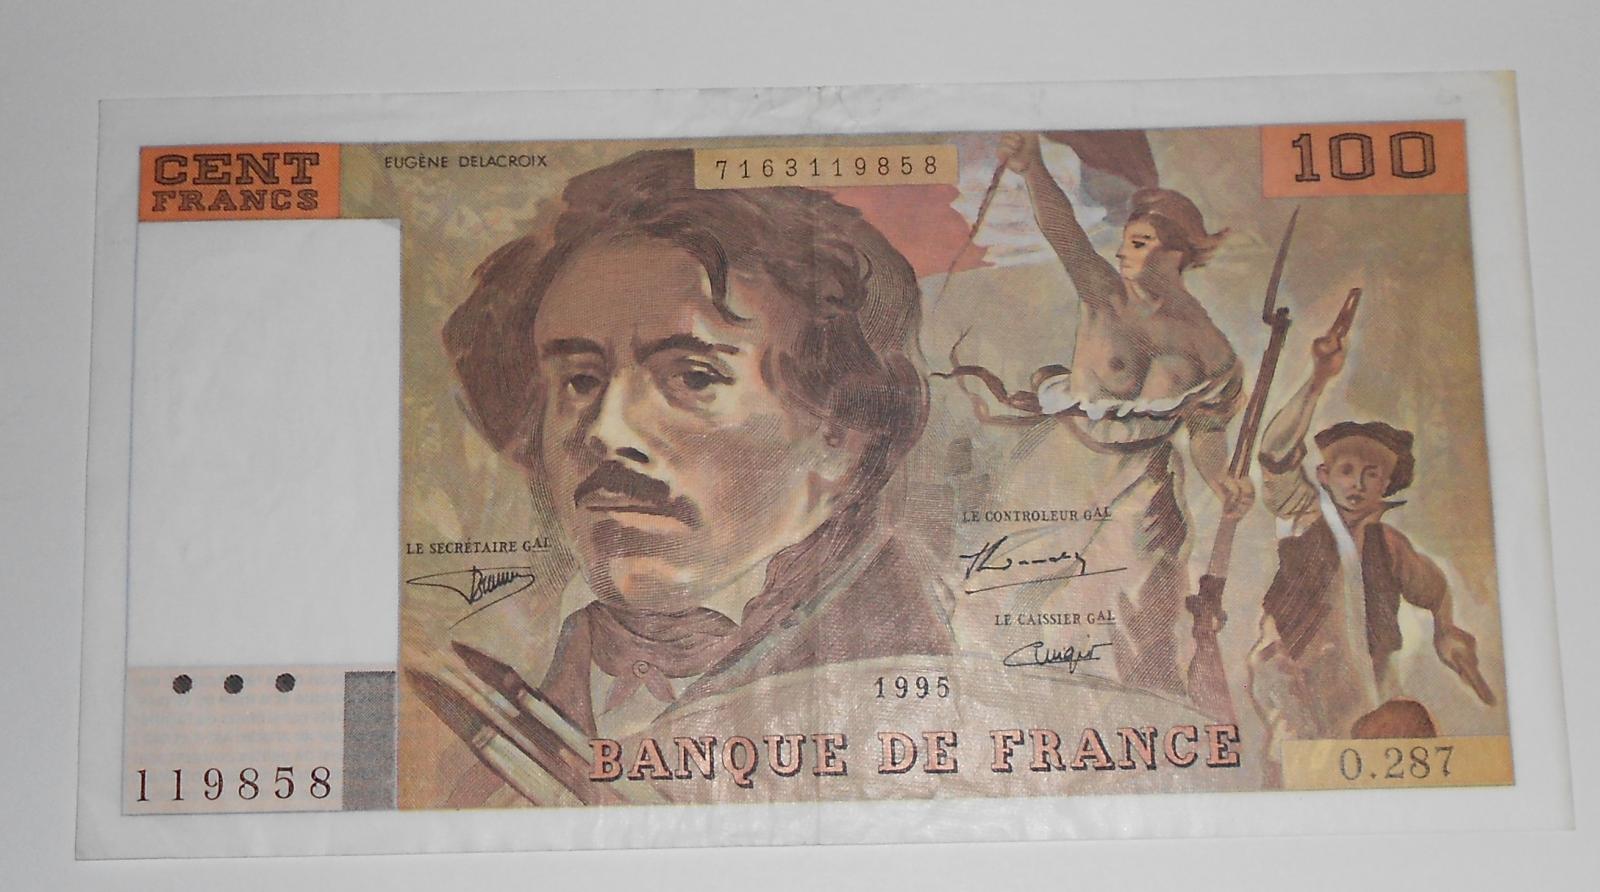 Francie 100 Frank 1995